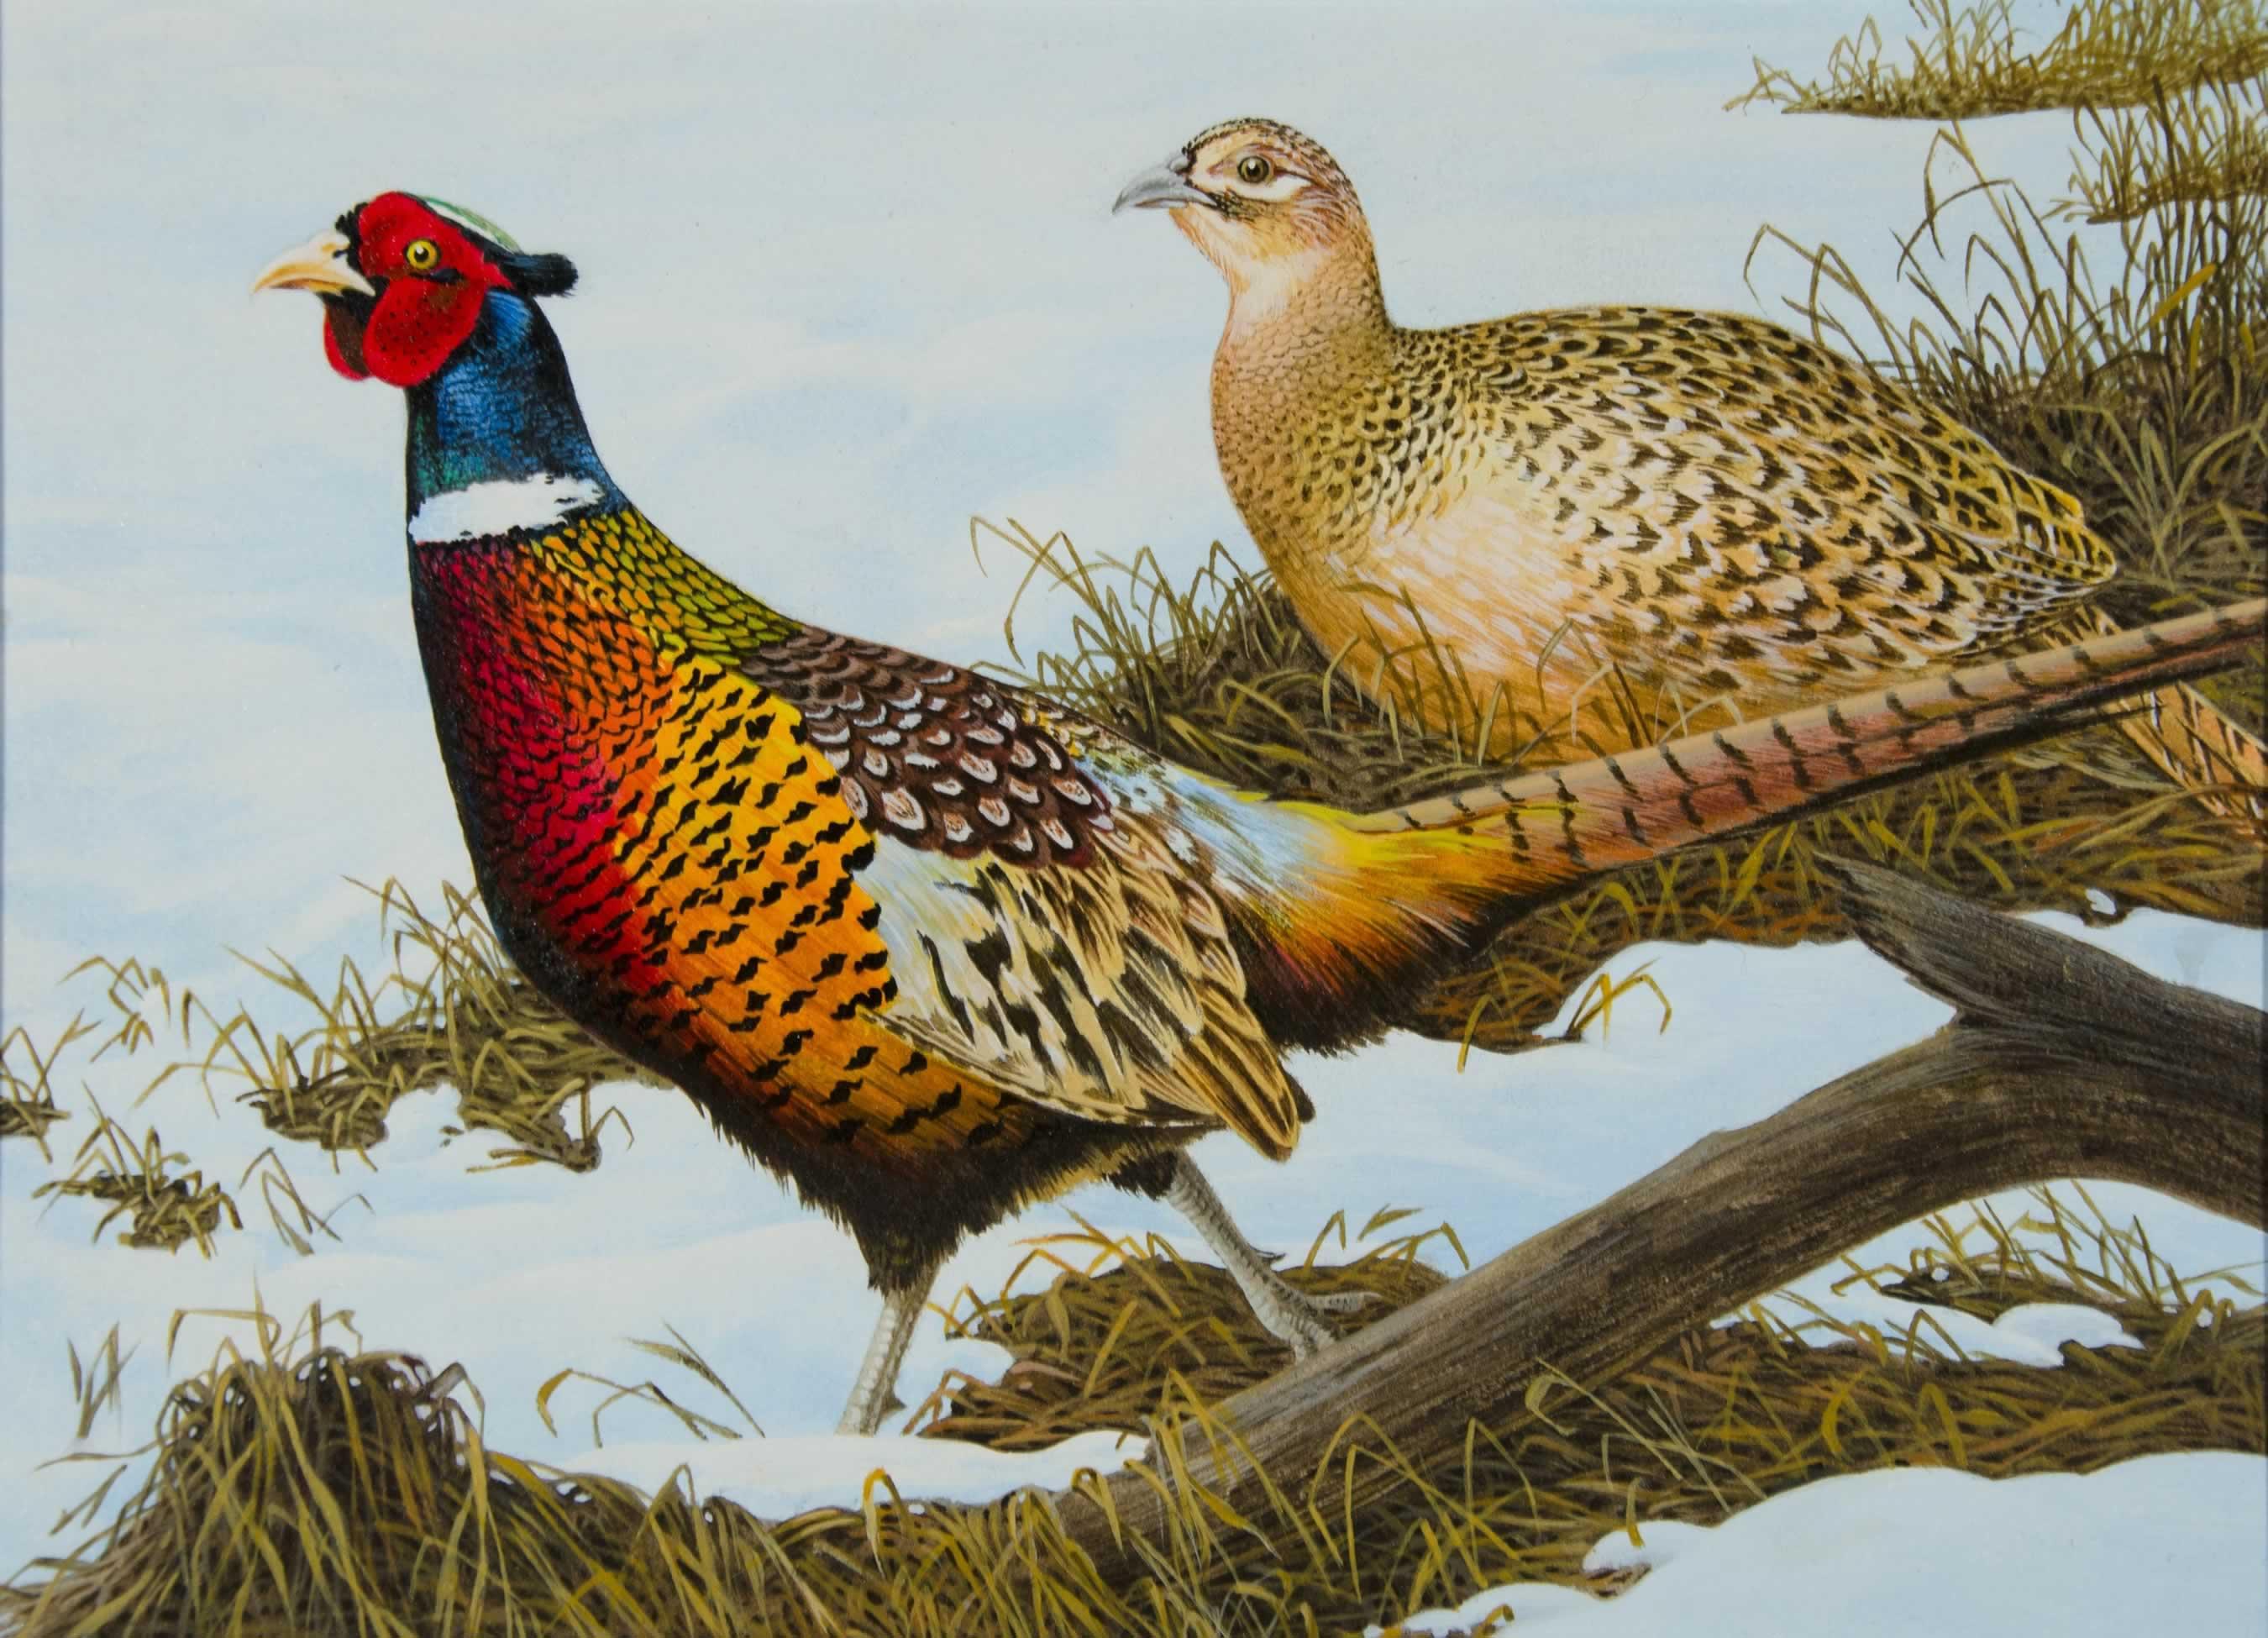 The 2019 Minnesota pheasant stamp